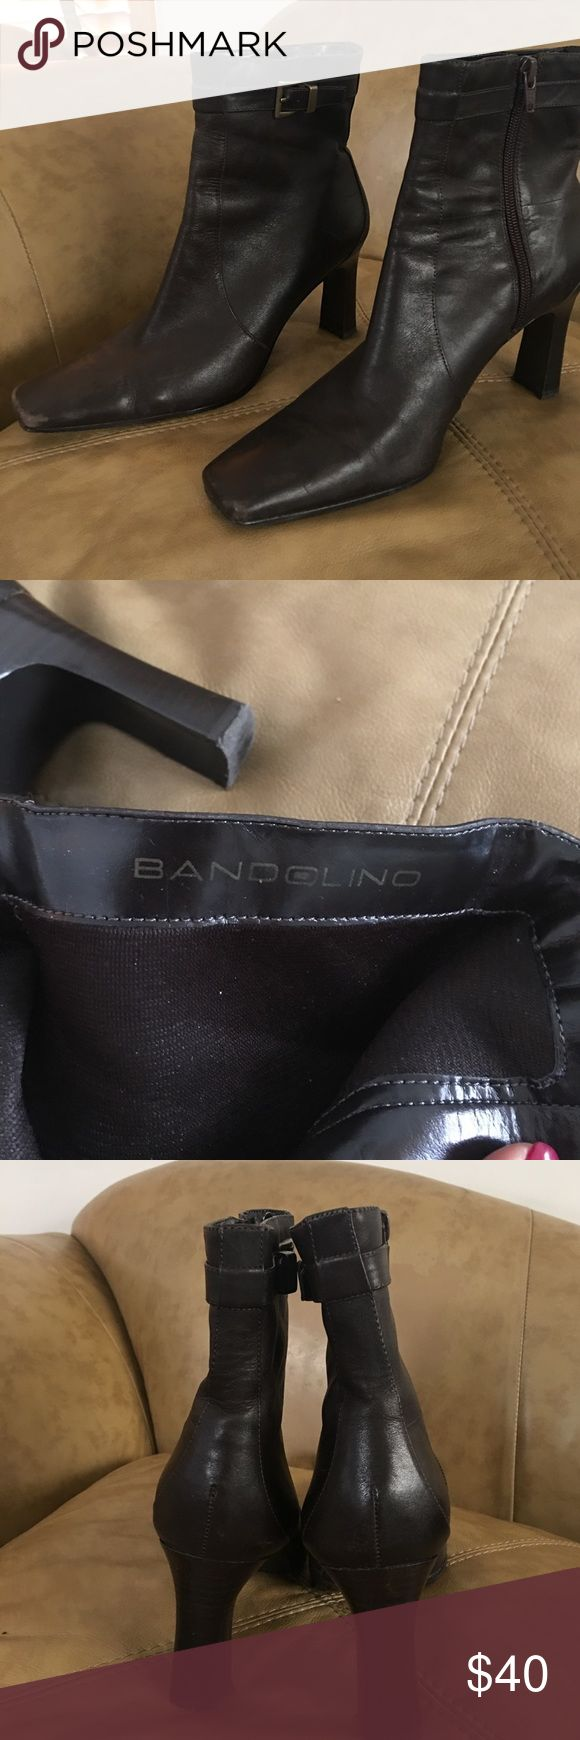 BANDOLINO BOOTS BANDOLINO Dark brown dress boot.  Gold Buckle top, sturdy heel.   Worn max 3 times!! Very new & comfortable! Bandolino Shoes Heeled Boots